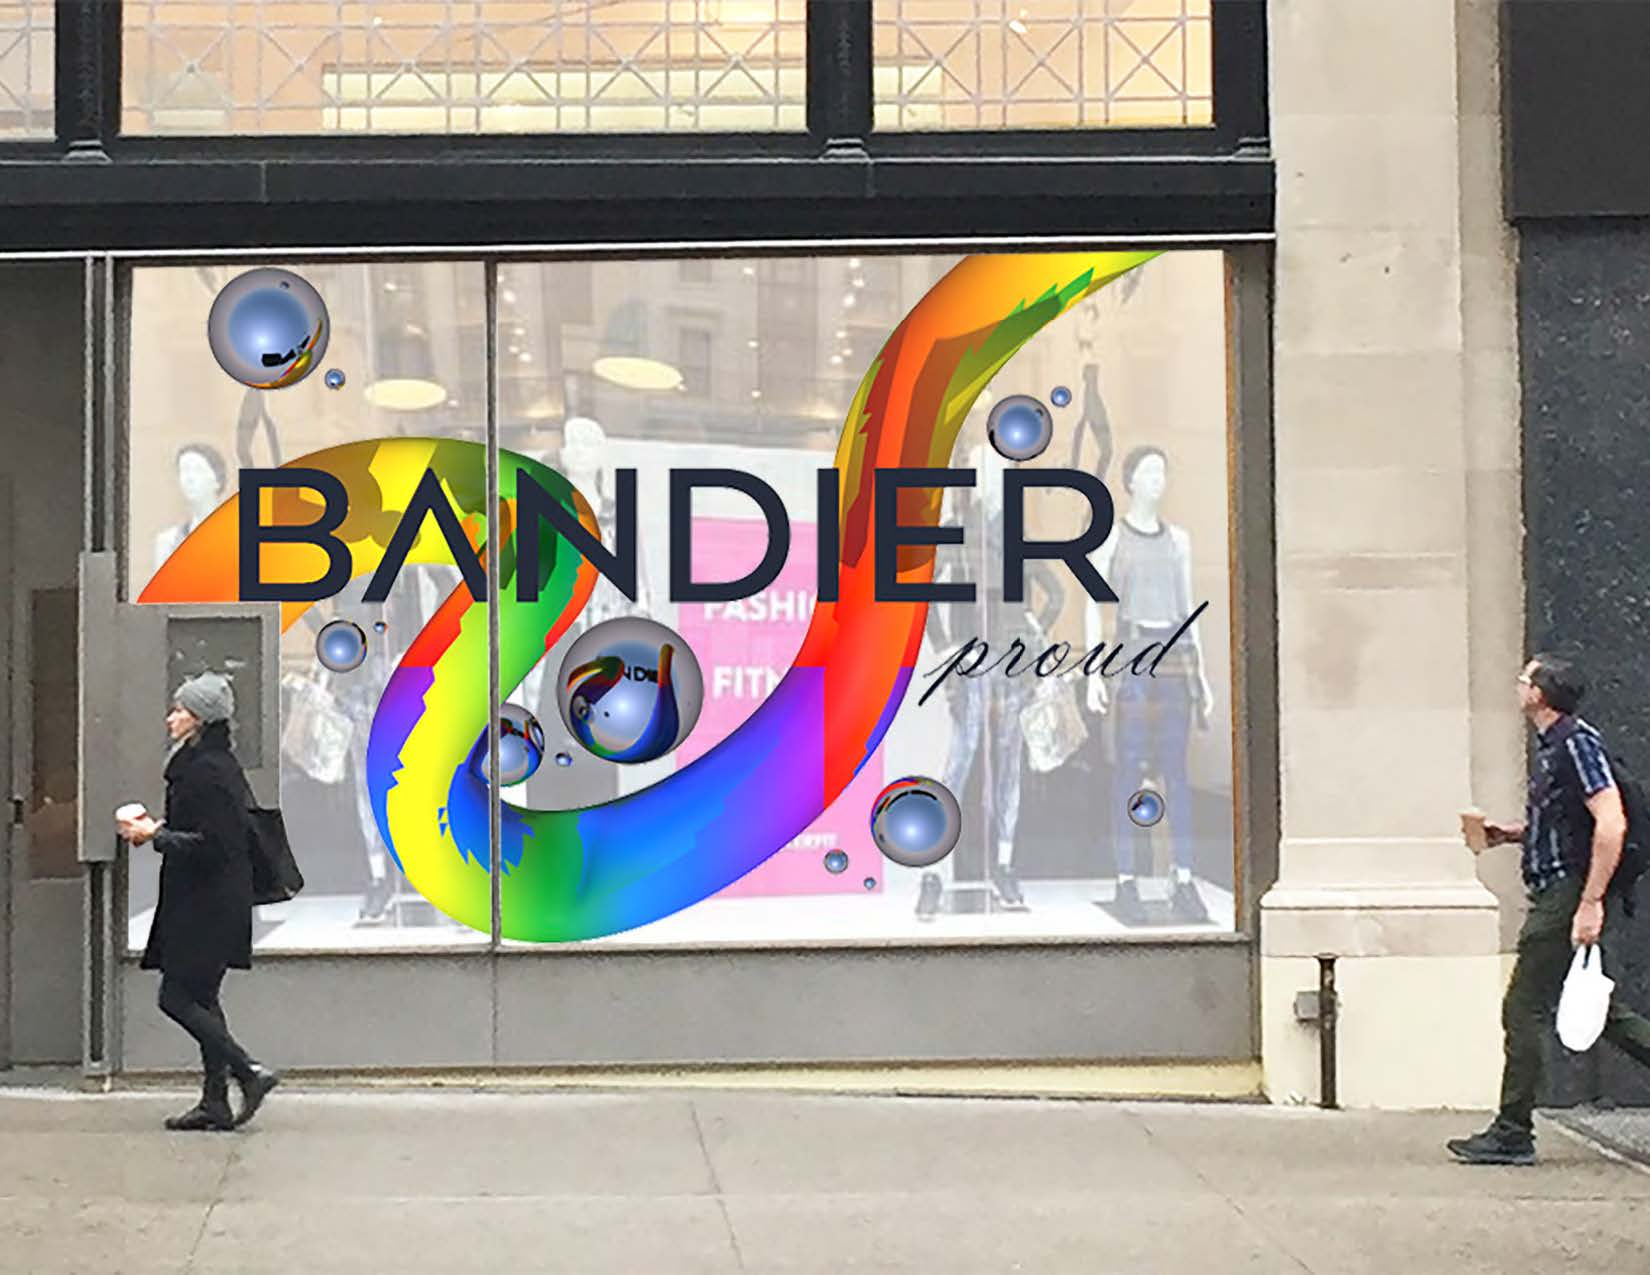 BANDIER_STOREFRONT DESIGN JUNE 2016_JANUARY 2017_sm_Page_05.jpg